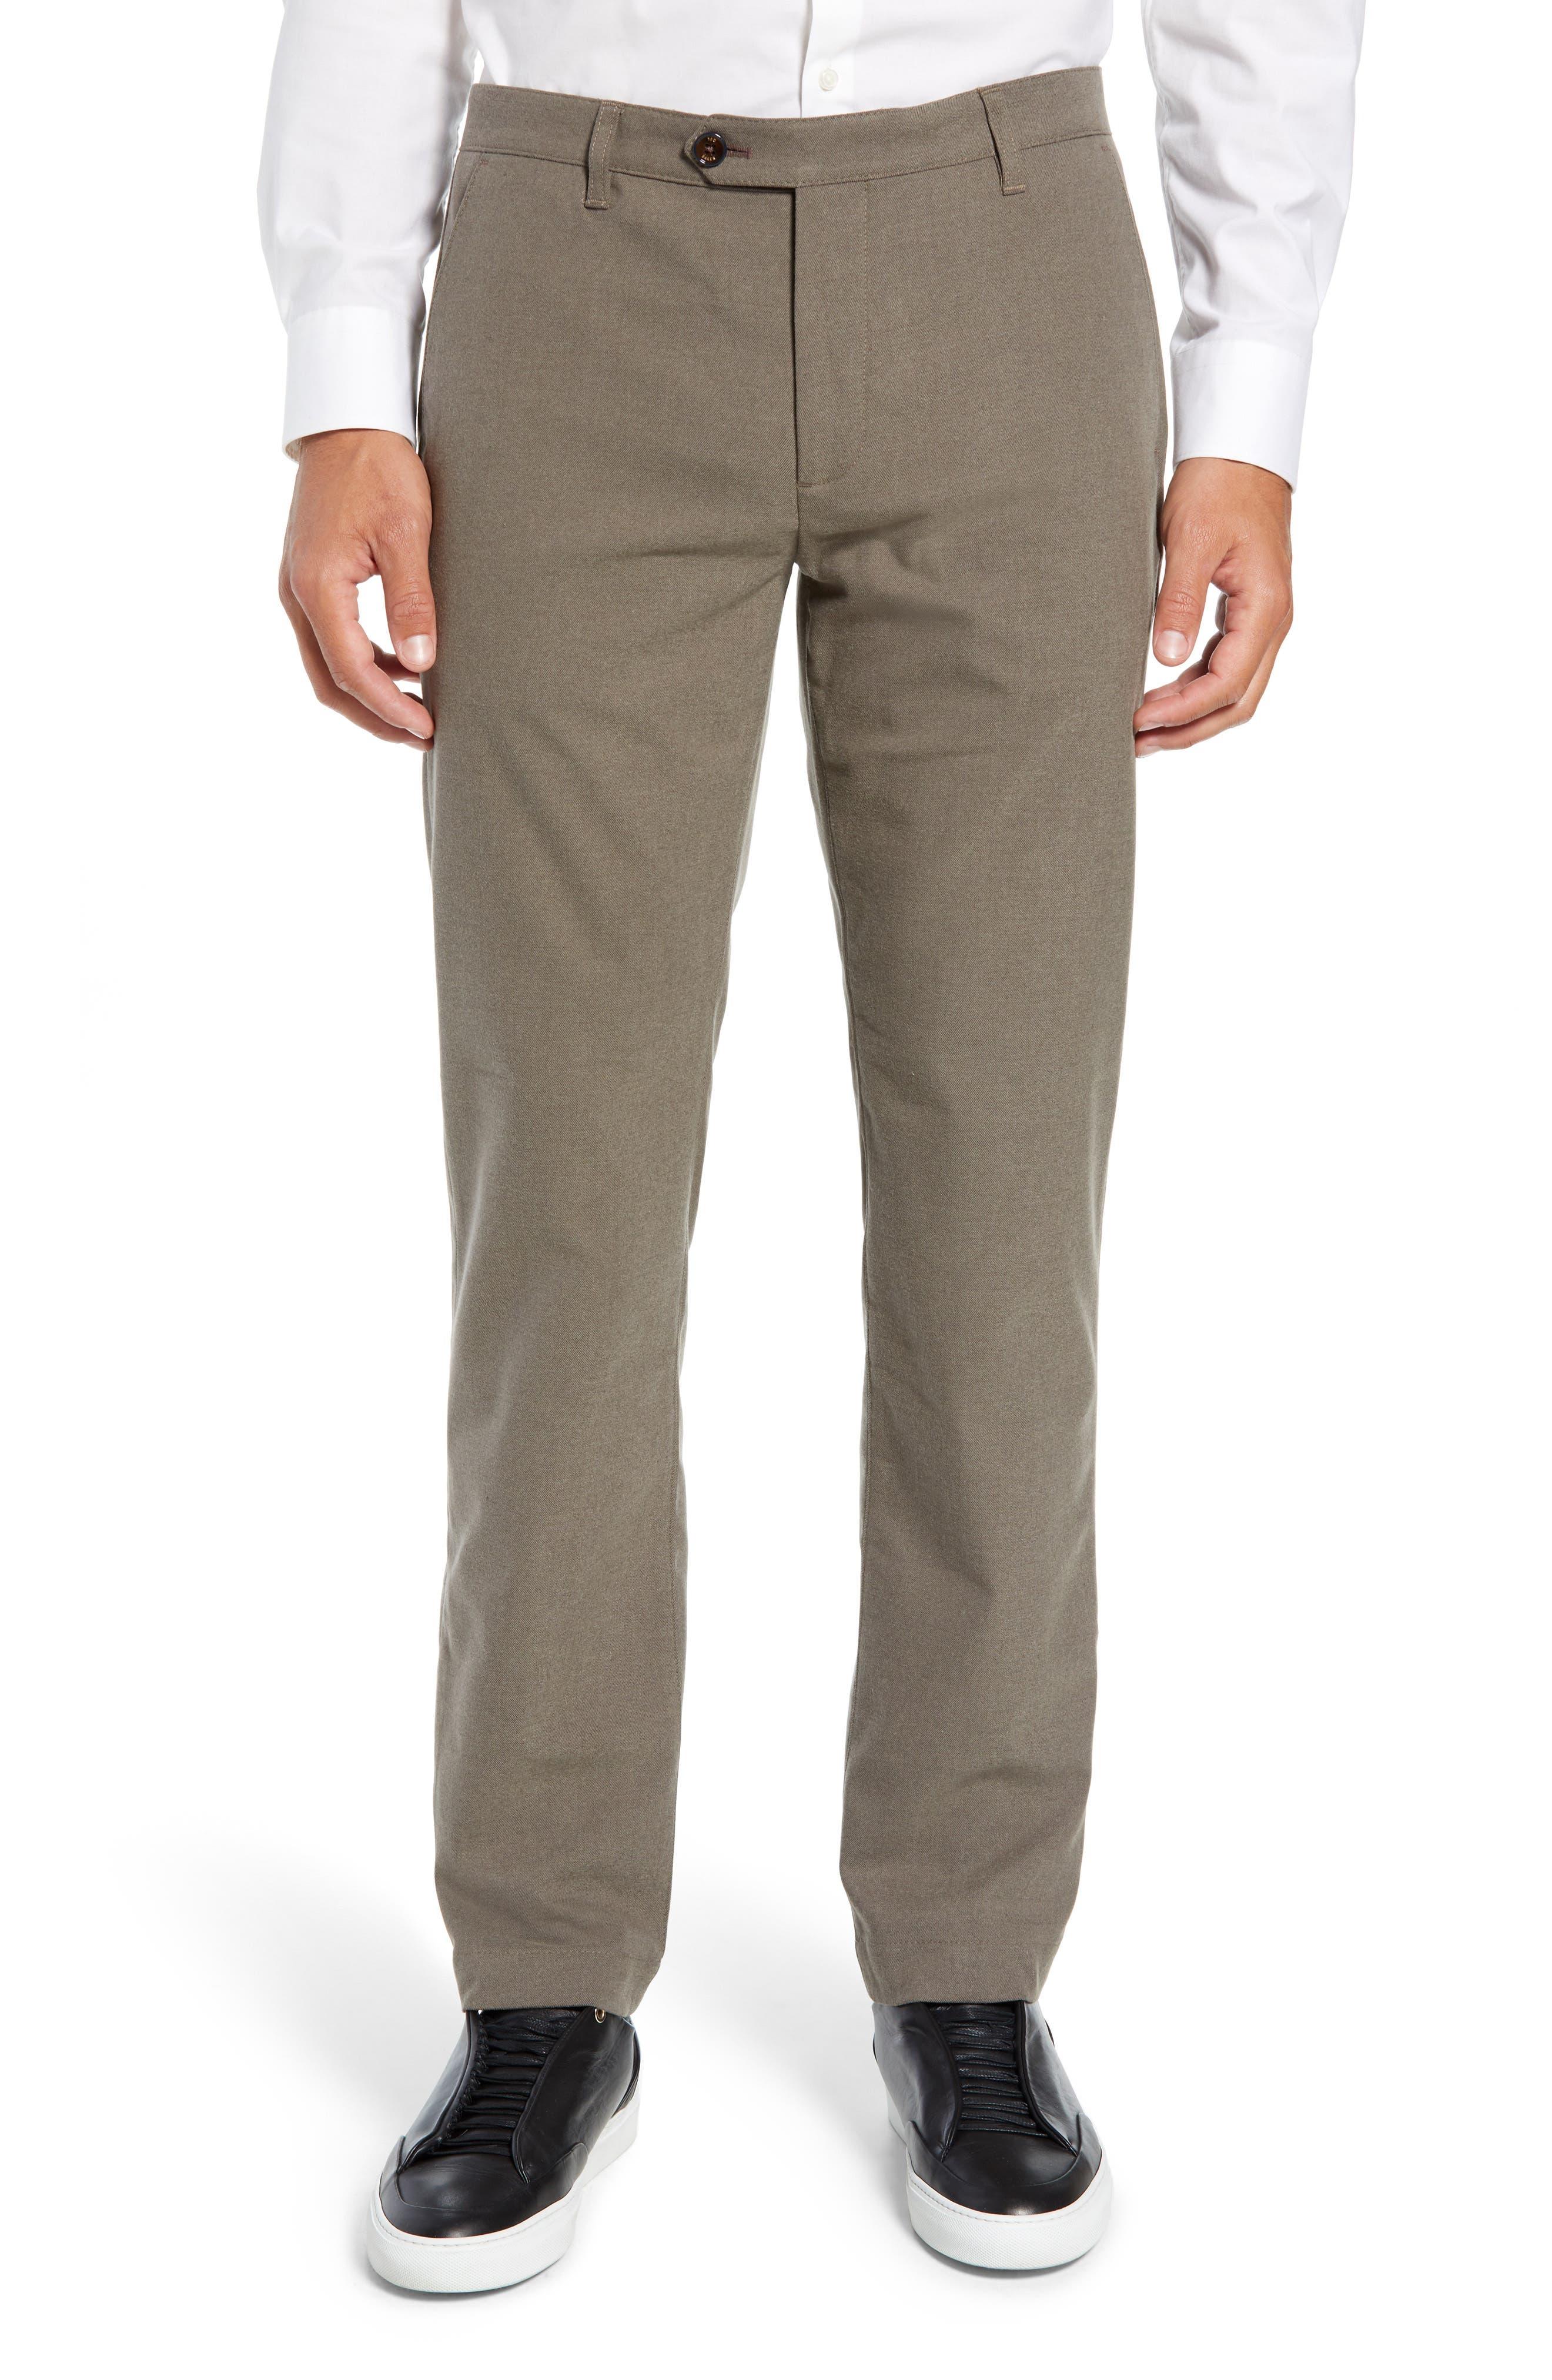 Semplin Slim Fit Brushed Trousers,                             Main thumbnail 1, color,                             NATURAL